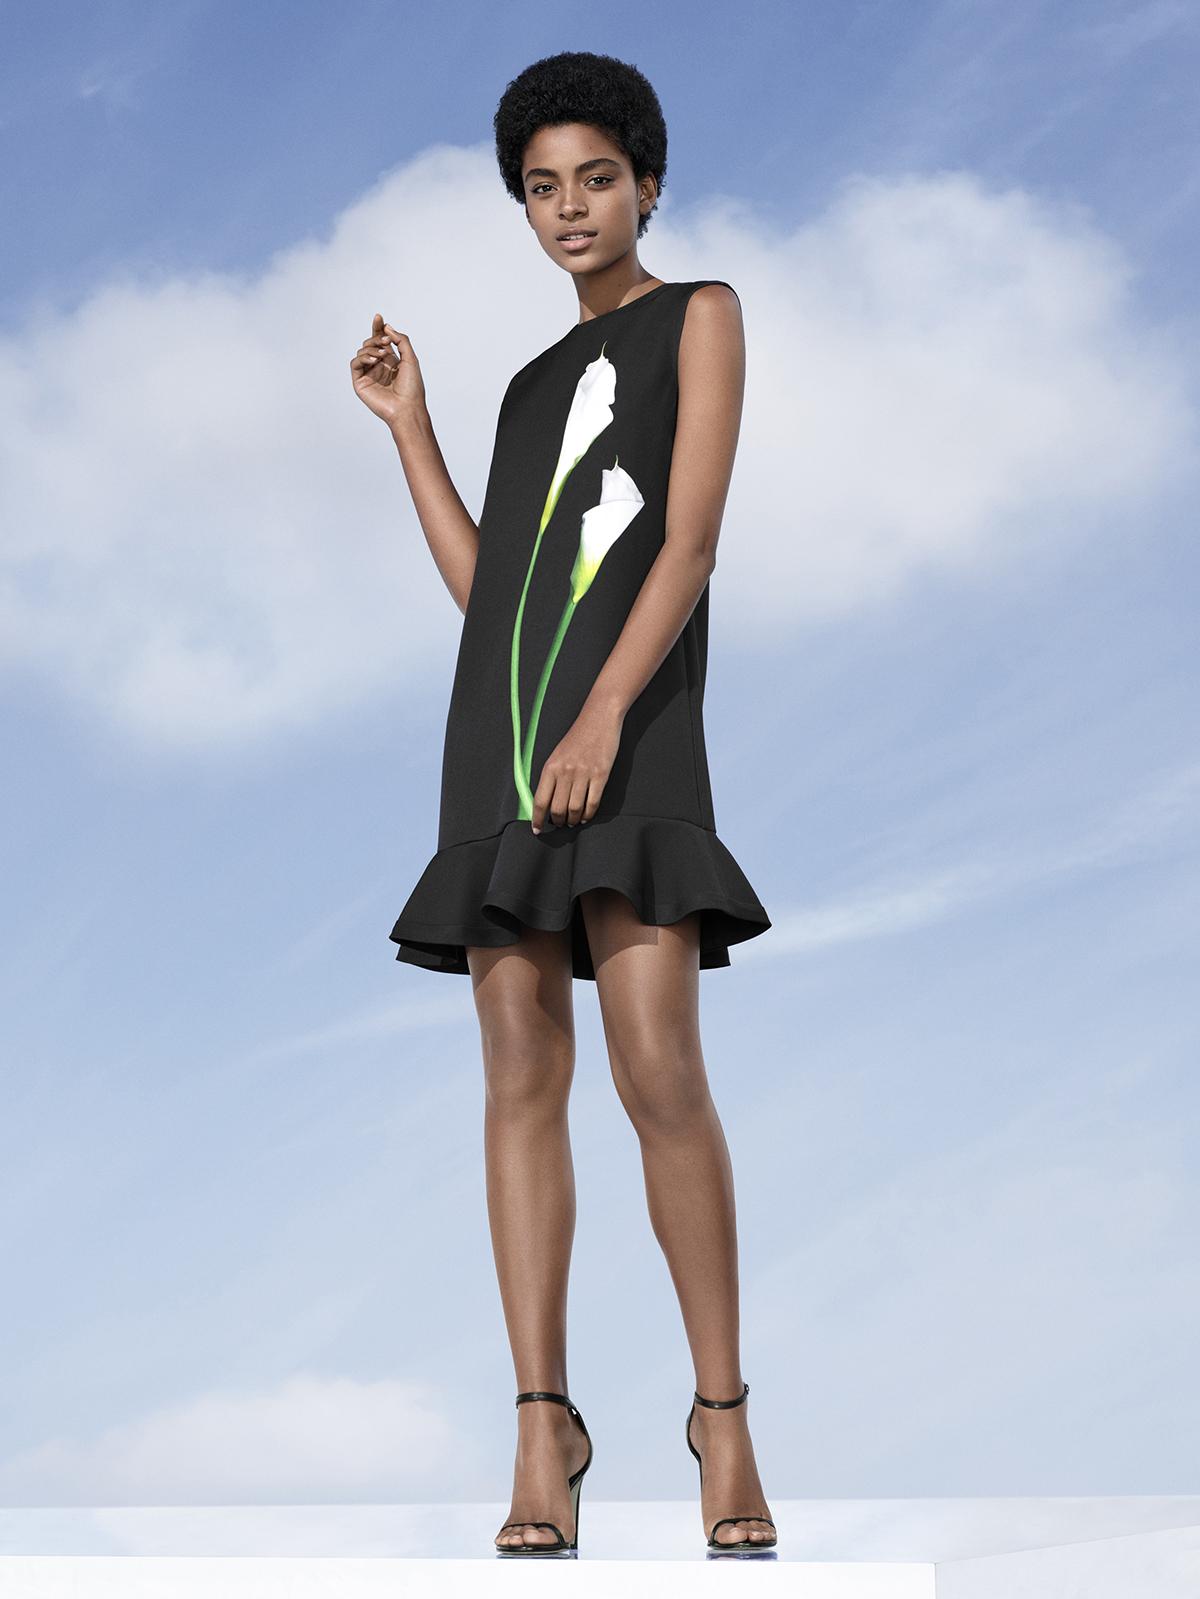 Lily Satin Ruffle Hem Dress, $35